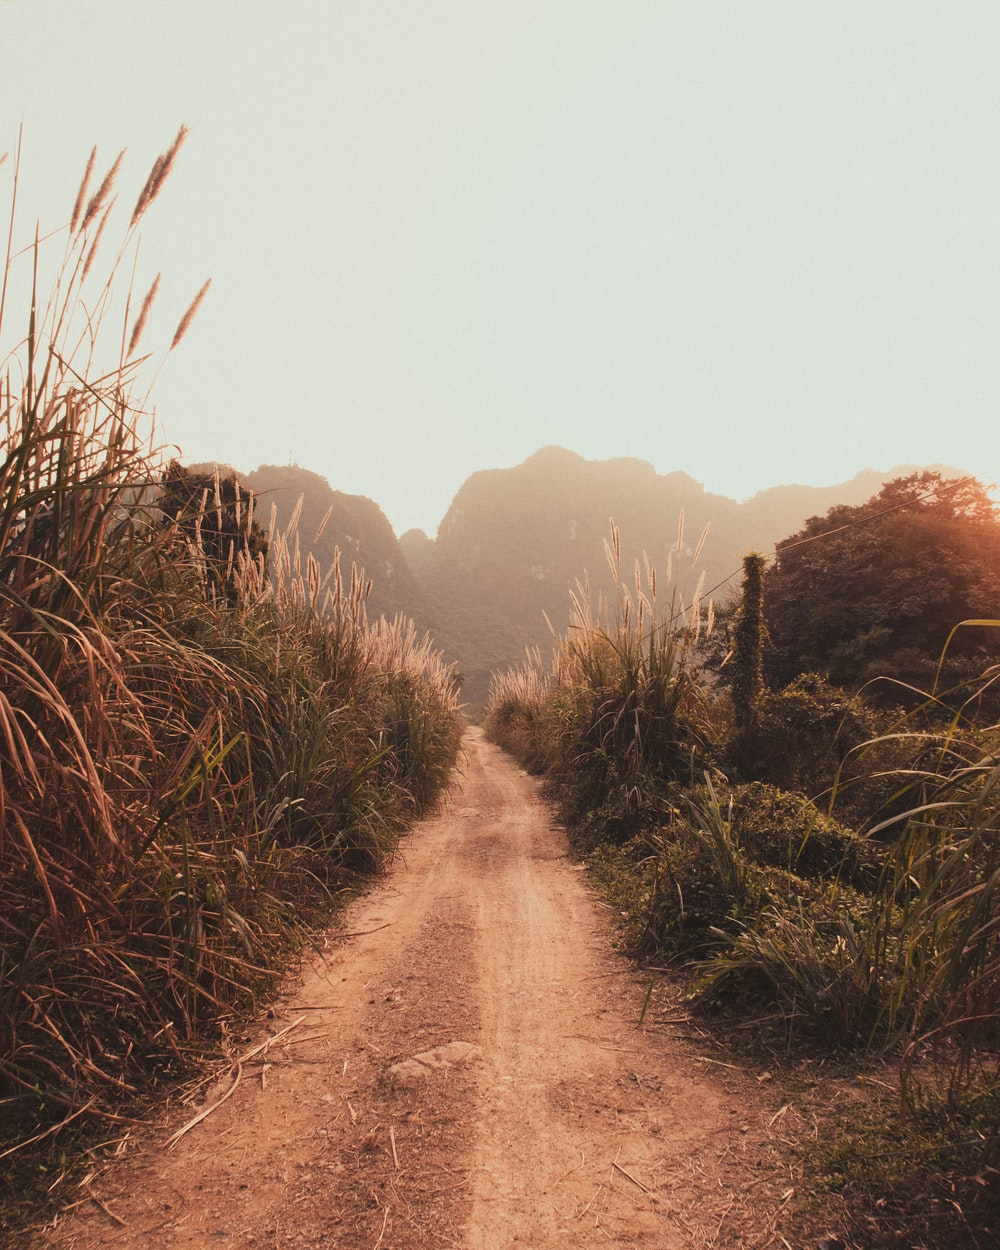 brown dirt road between green grass field during daytime